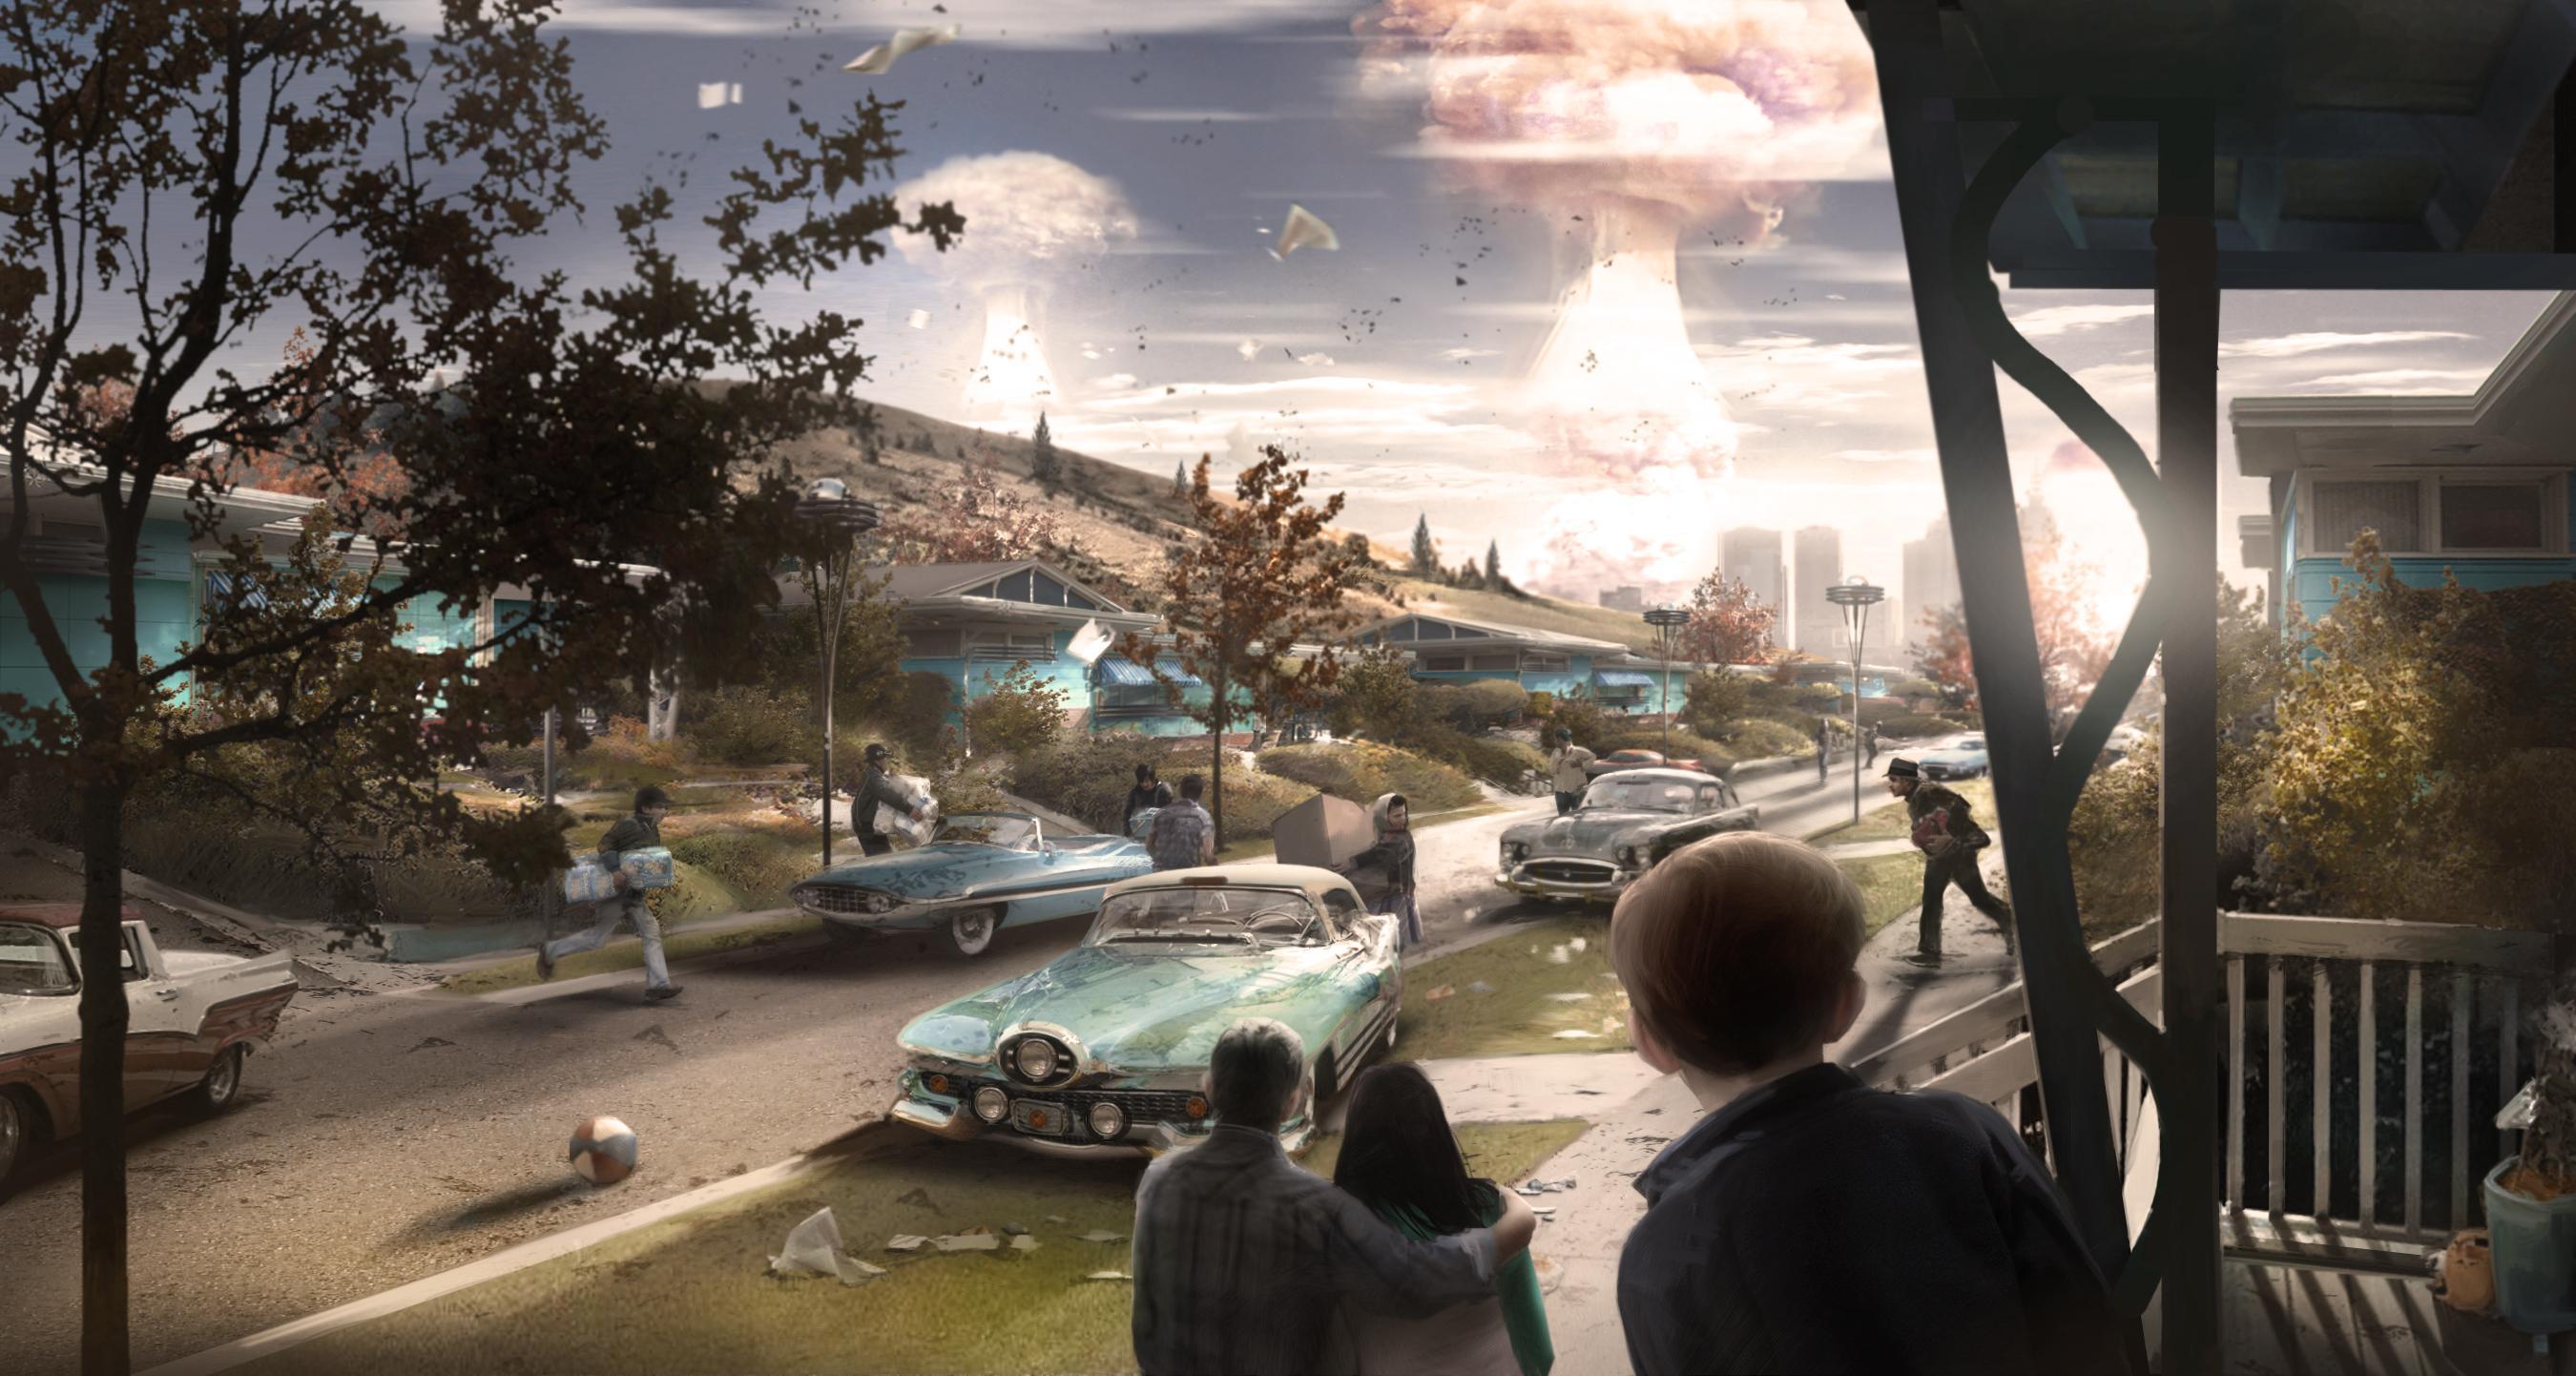 Fallout clipart pib (PC/PS4/XB1) Fallout 4